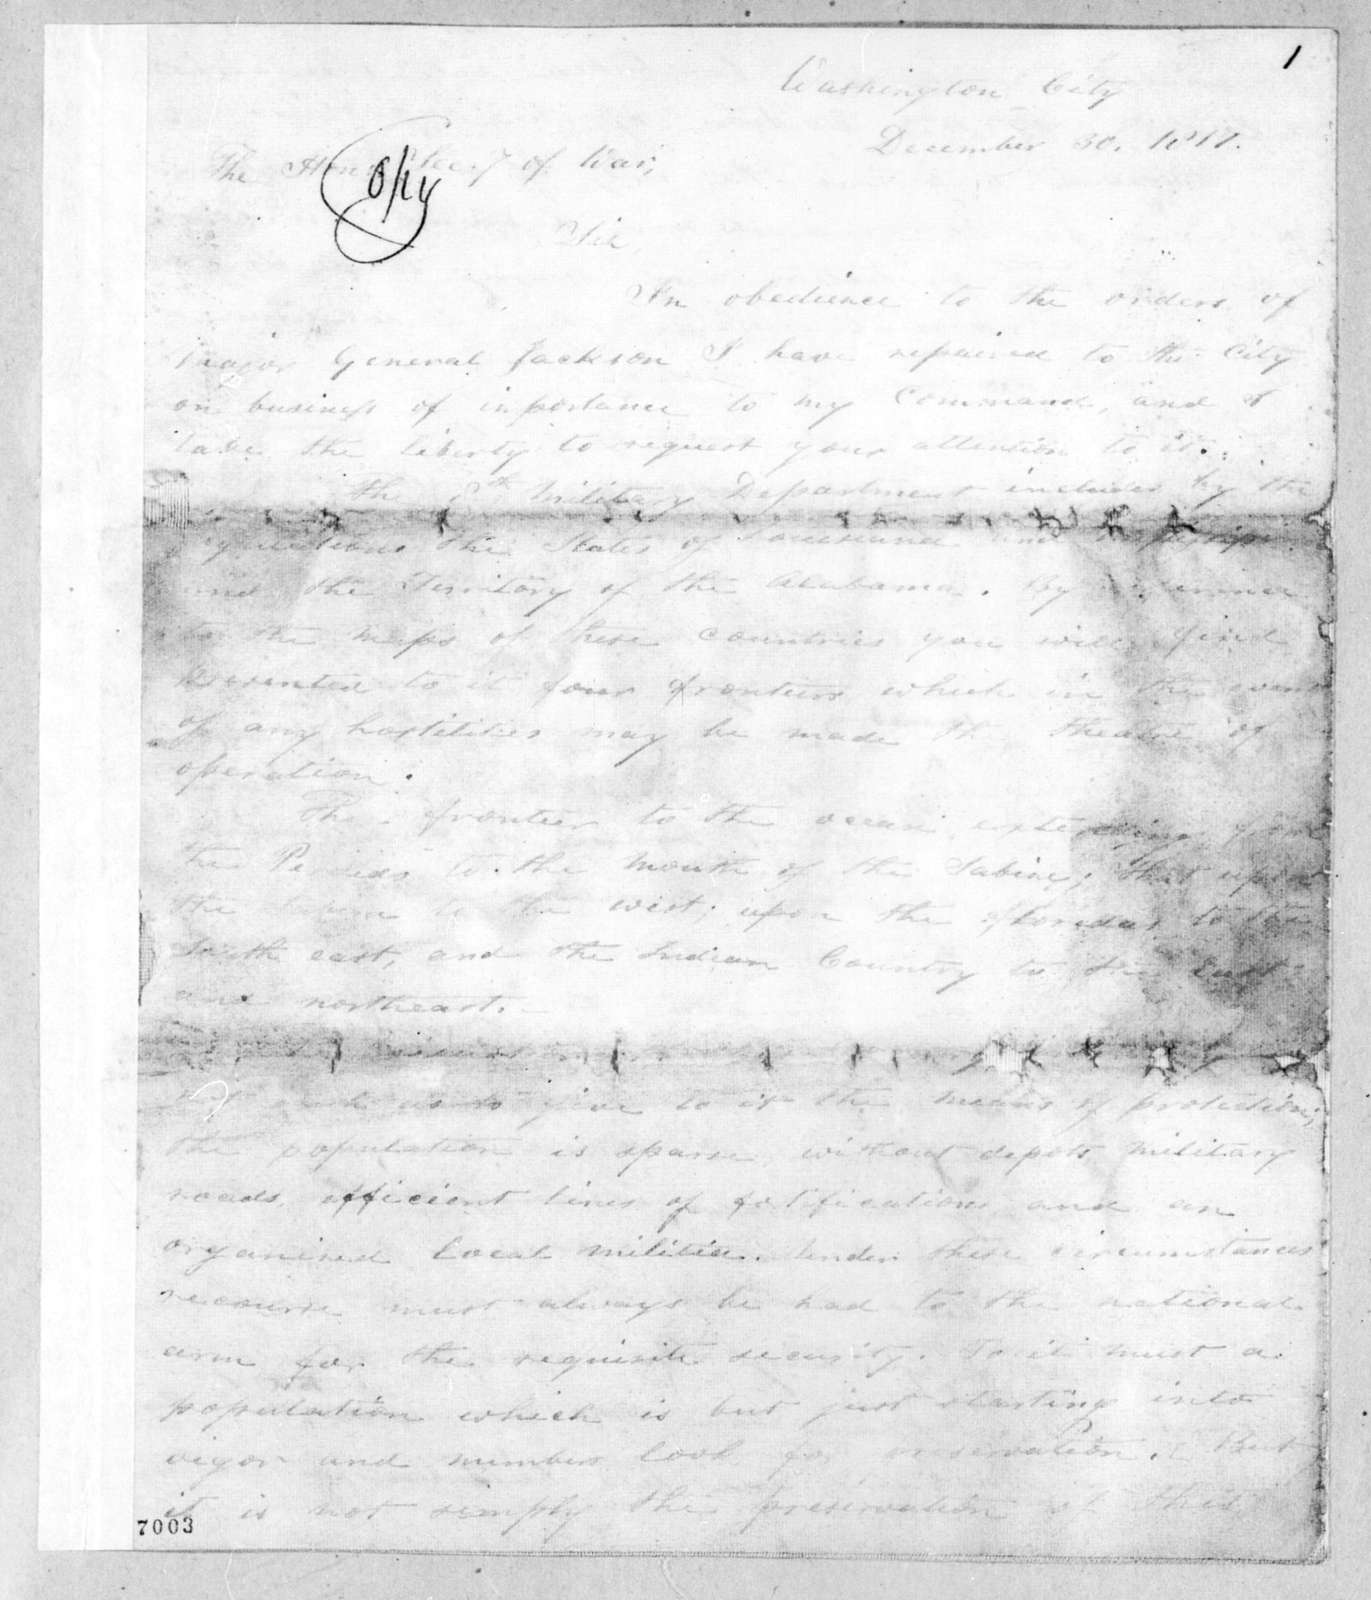 Eleazar Wheelock Ripley to John Caldwell Calhoun, December 30, 1817